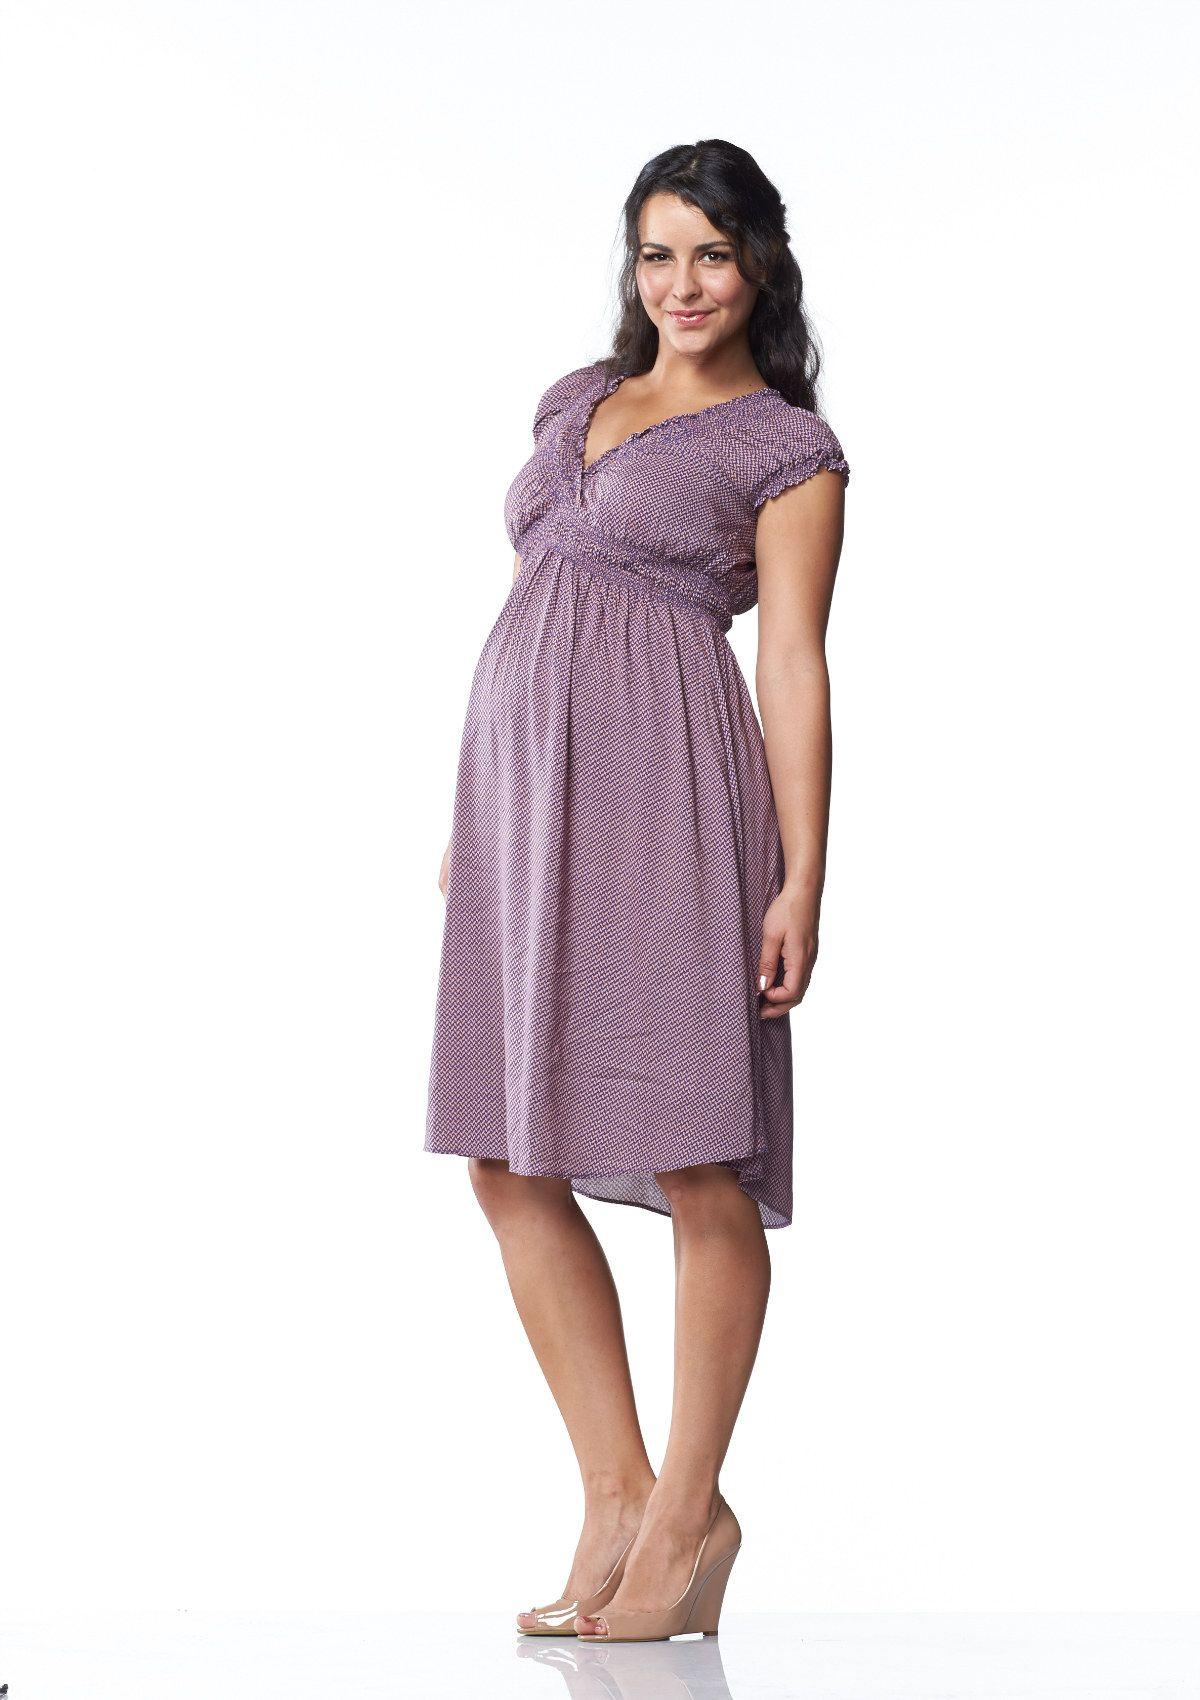 maternity dress Australia - Magnolia ...